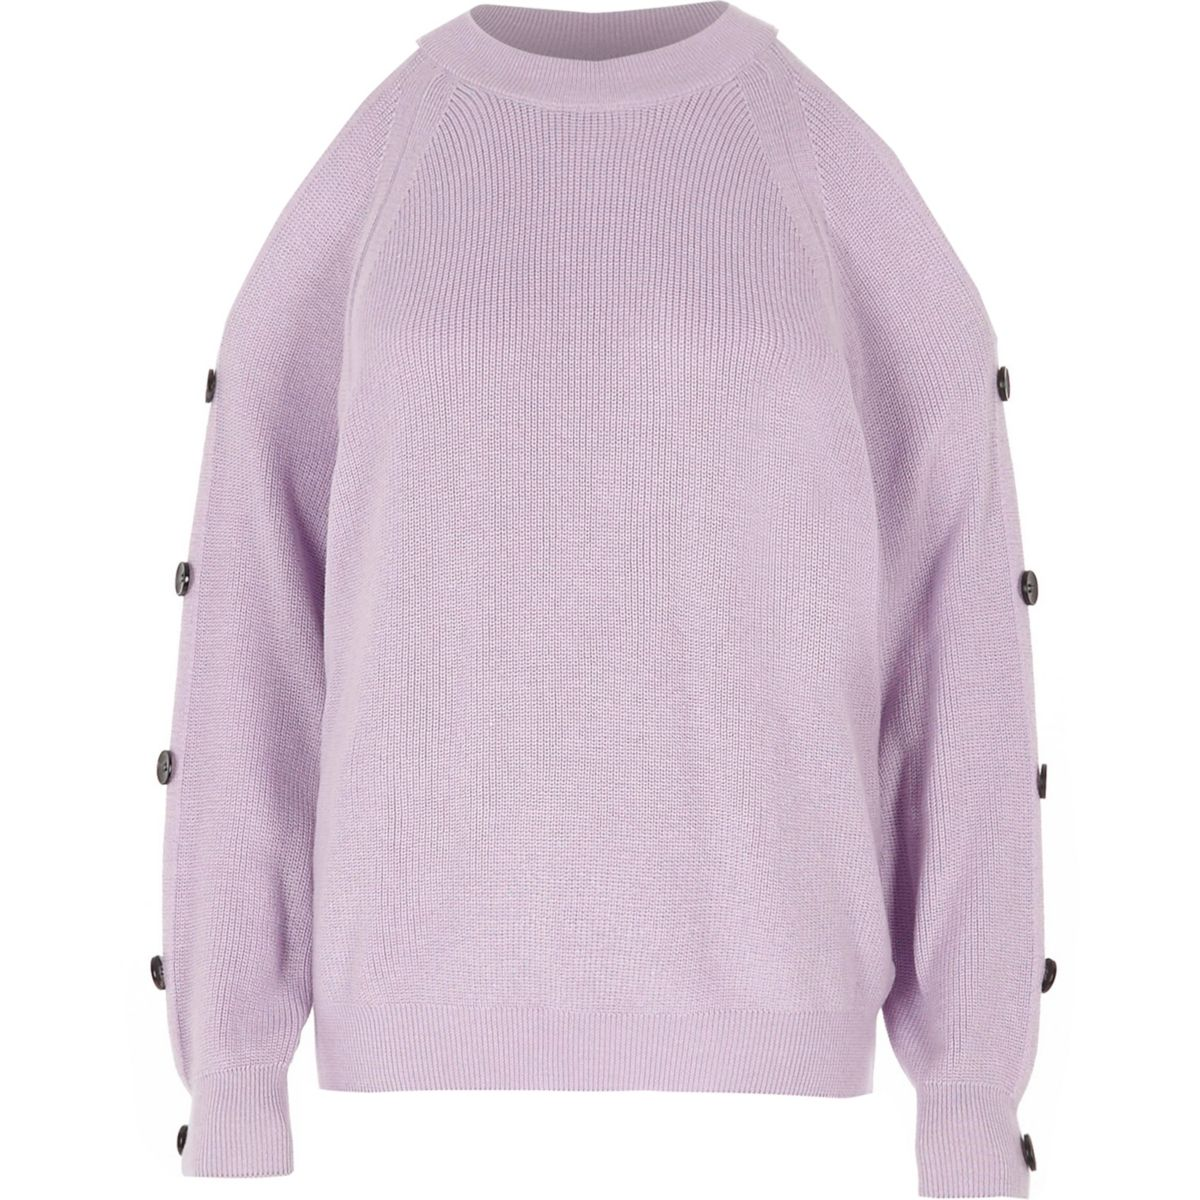 Light purple knit cold shoulder sweater